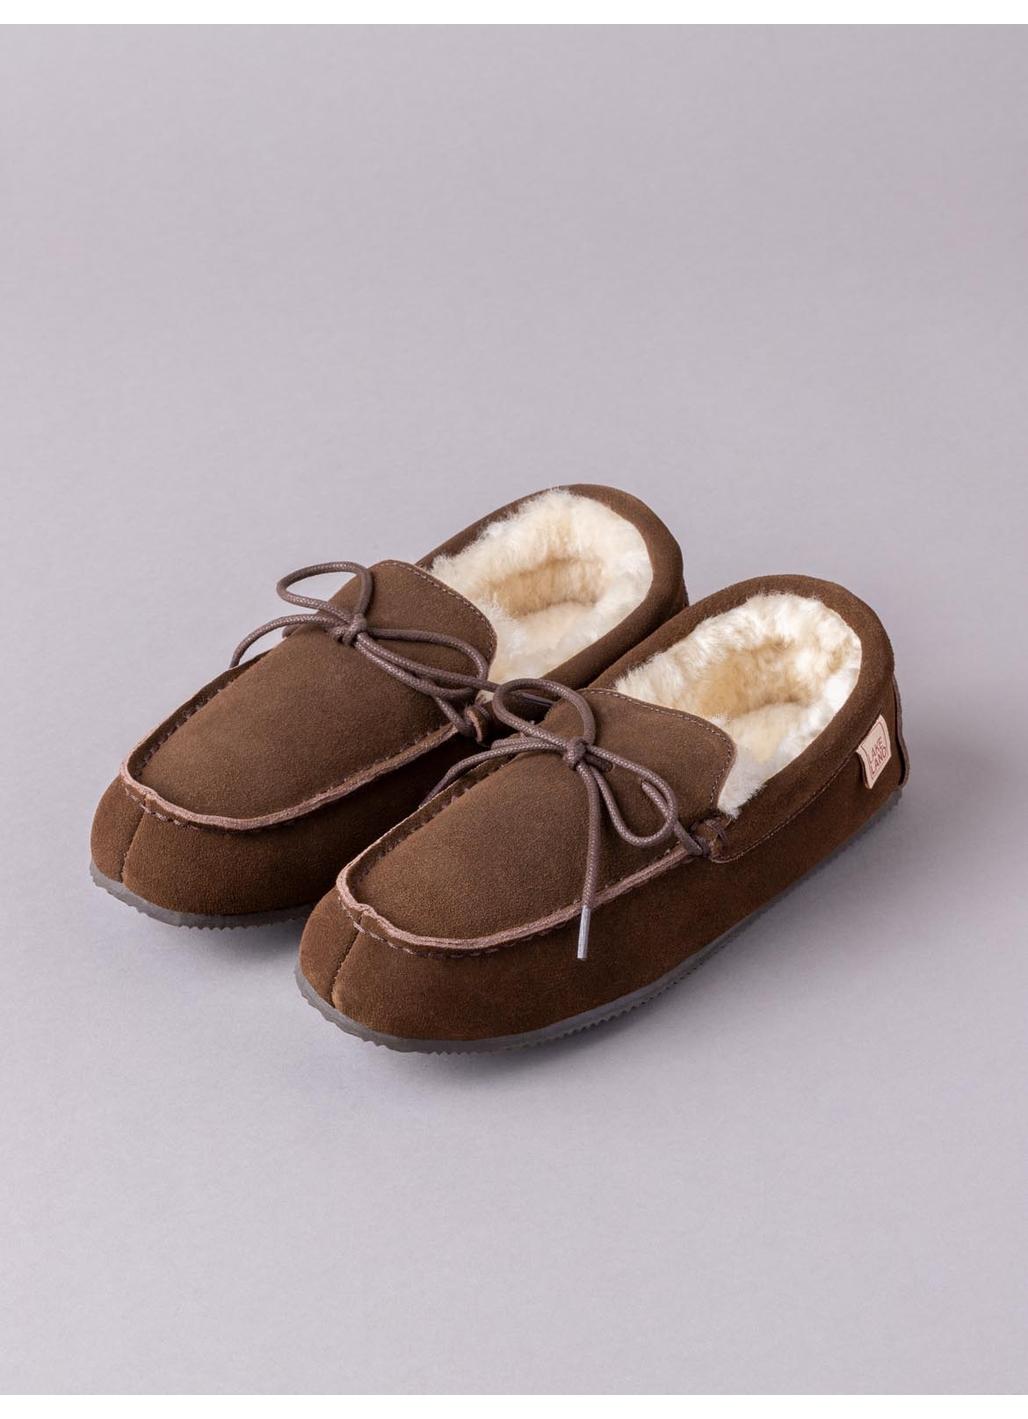 Men's Sheepskin Moccasins in Brown